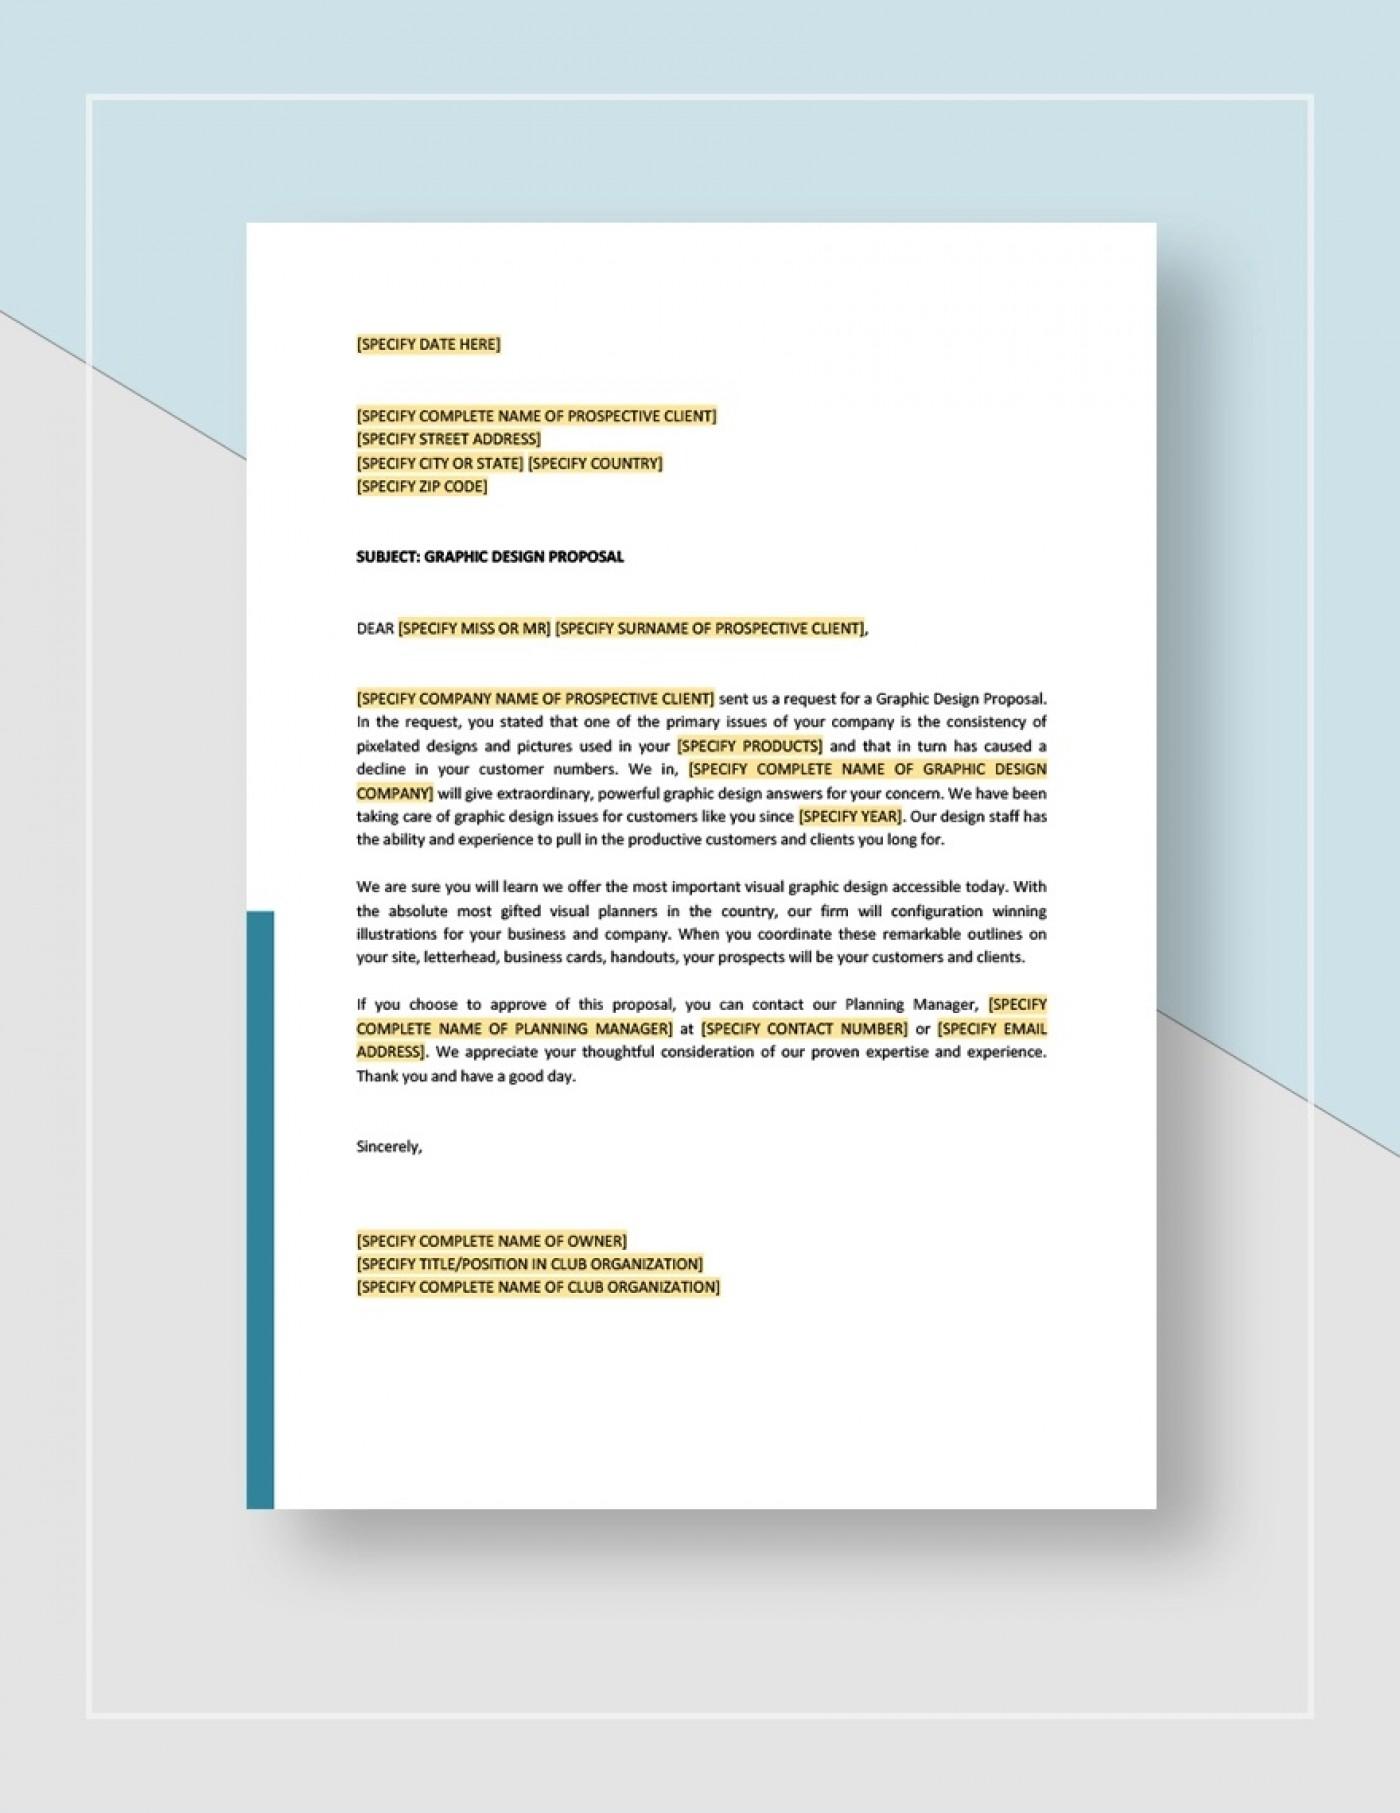 Graphic Design Proposal Template Sample Idea Jpg  Pdf1400